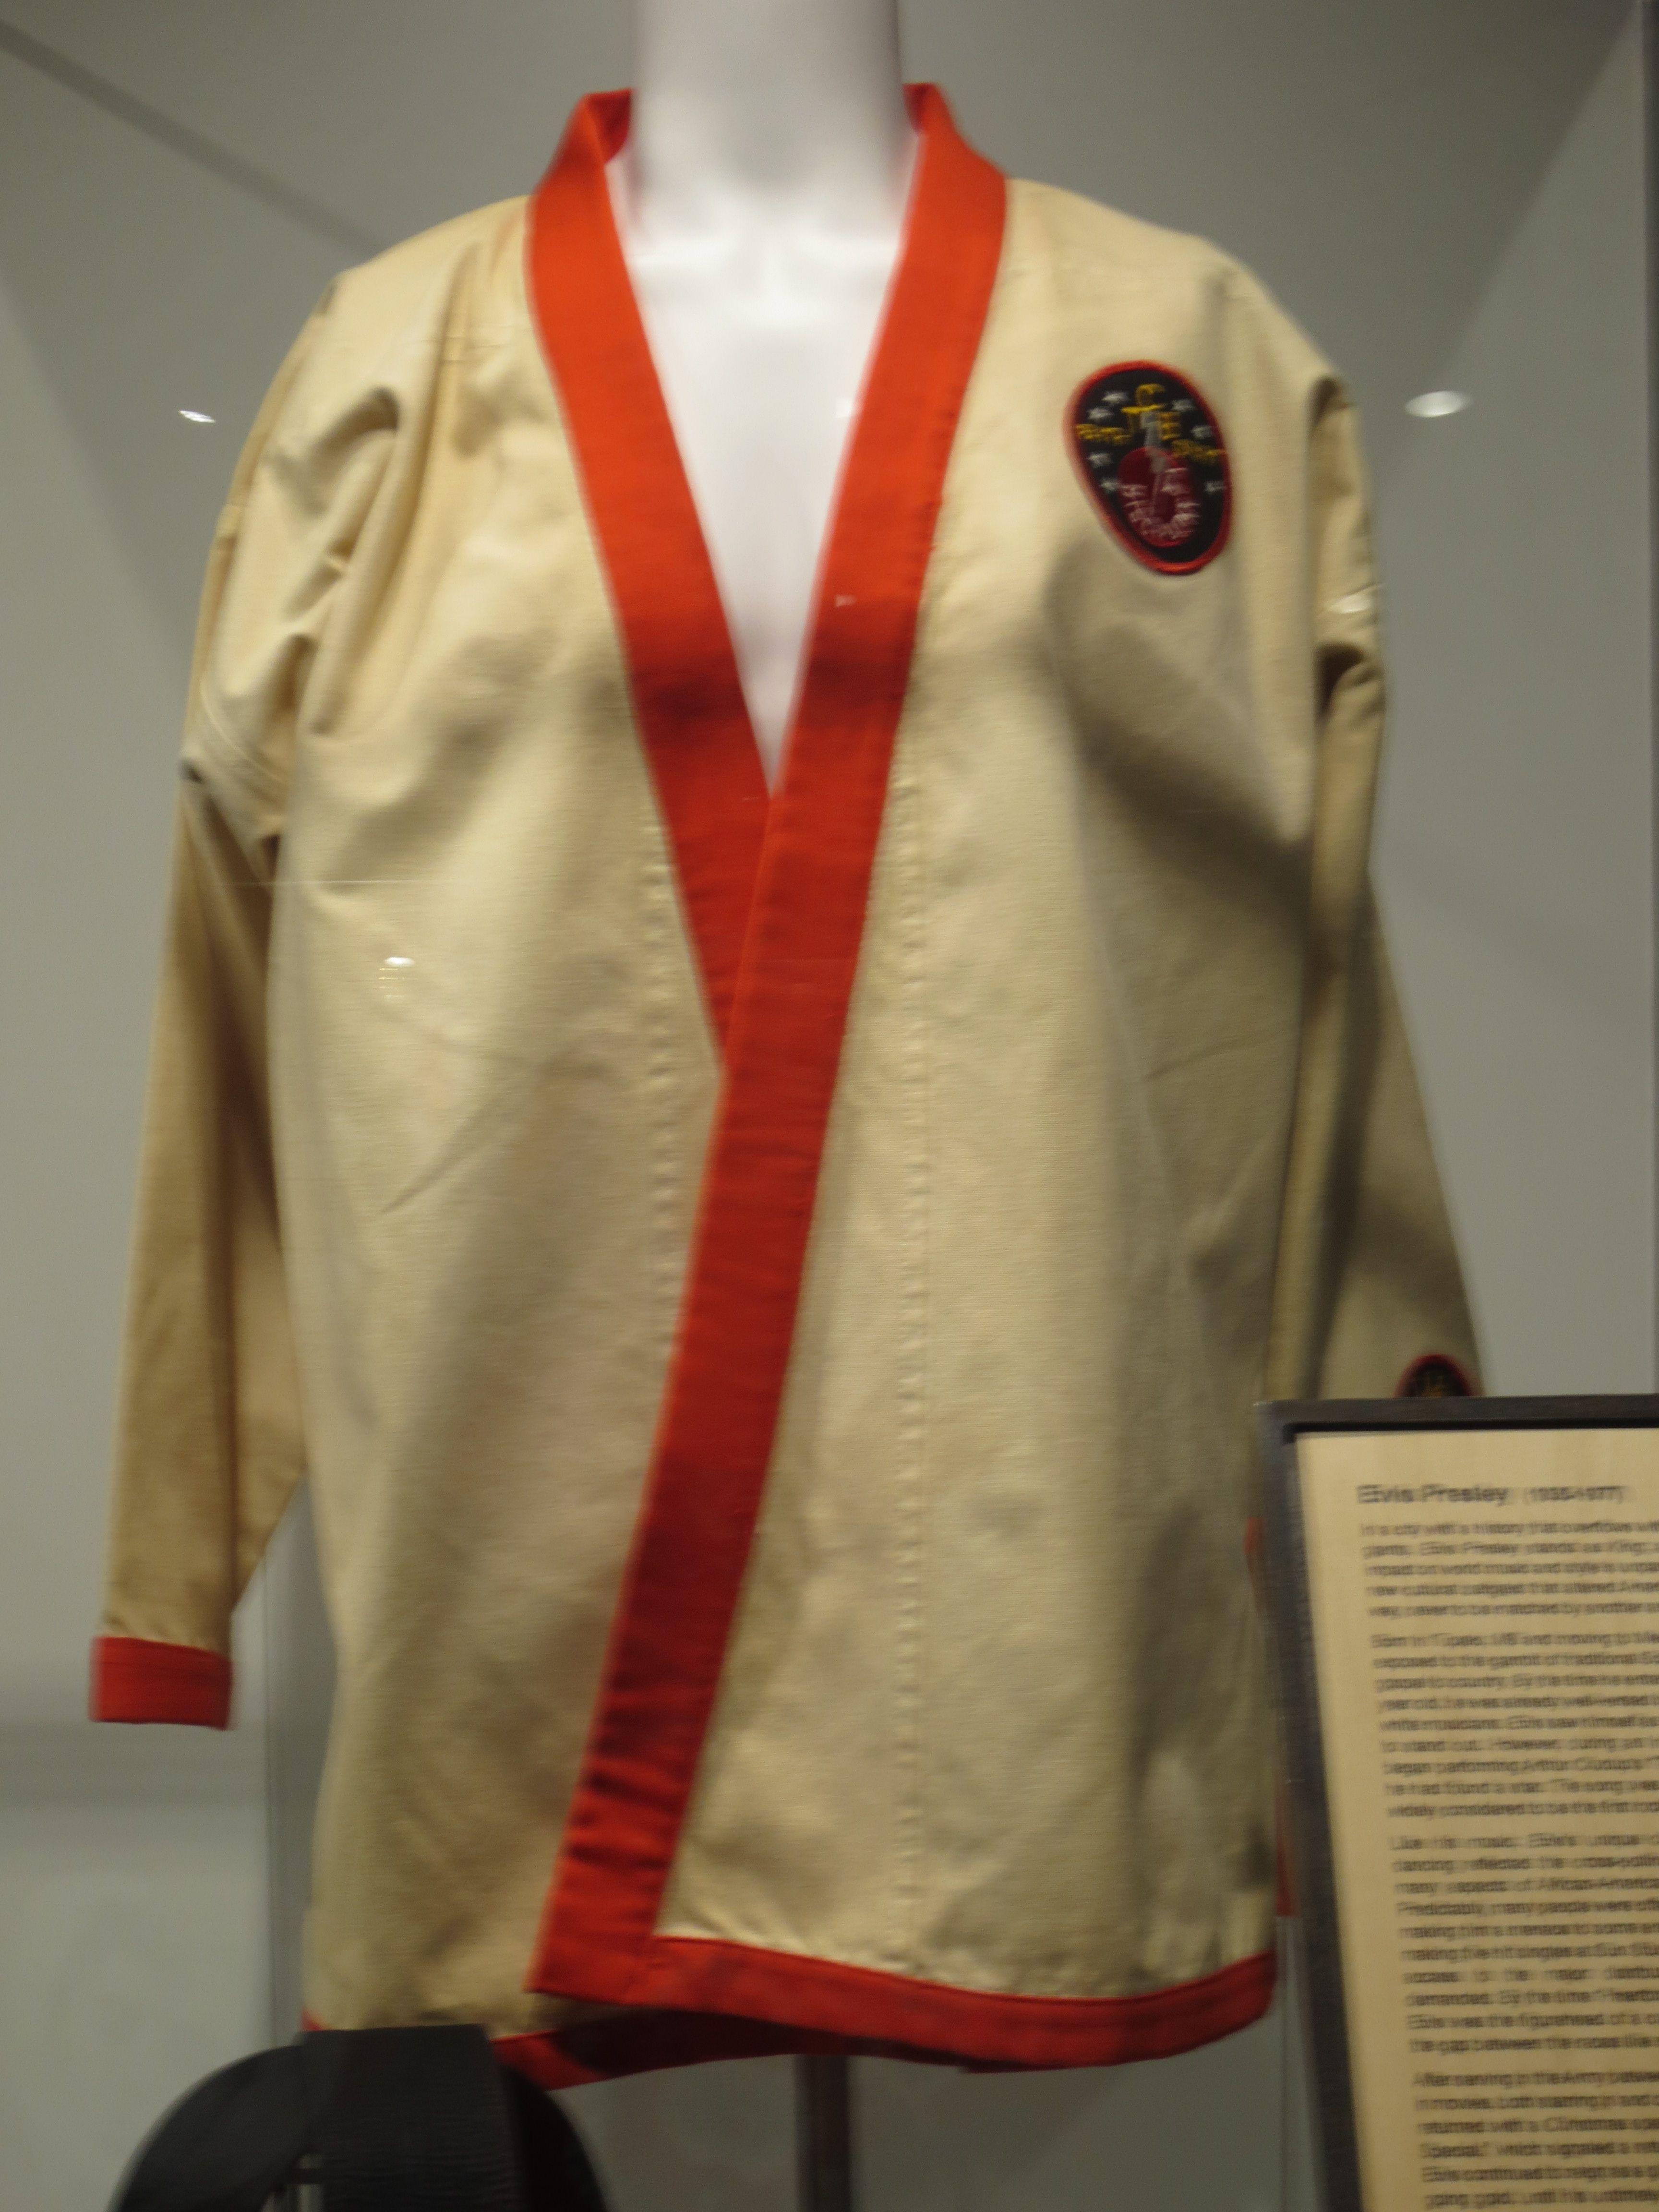 Elvis karate outfit